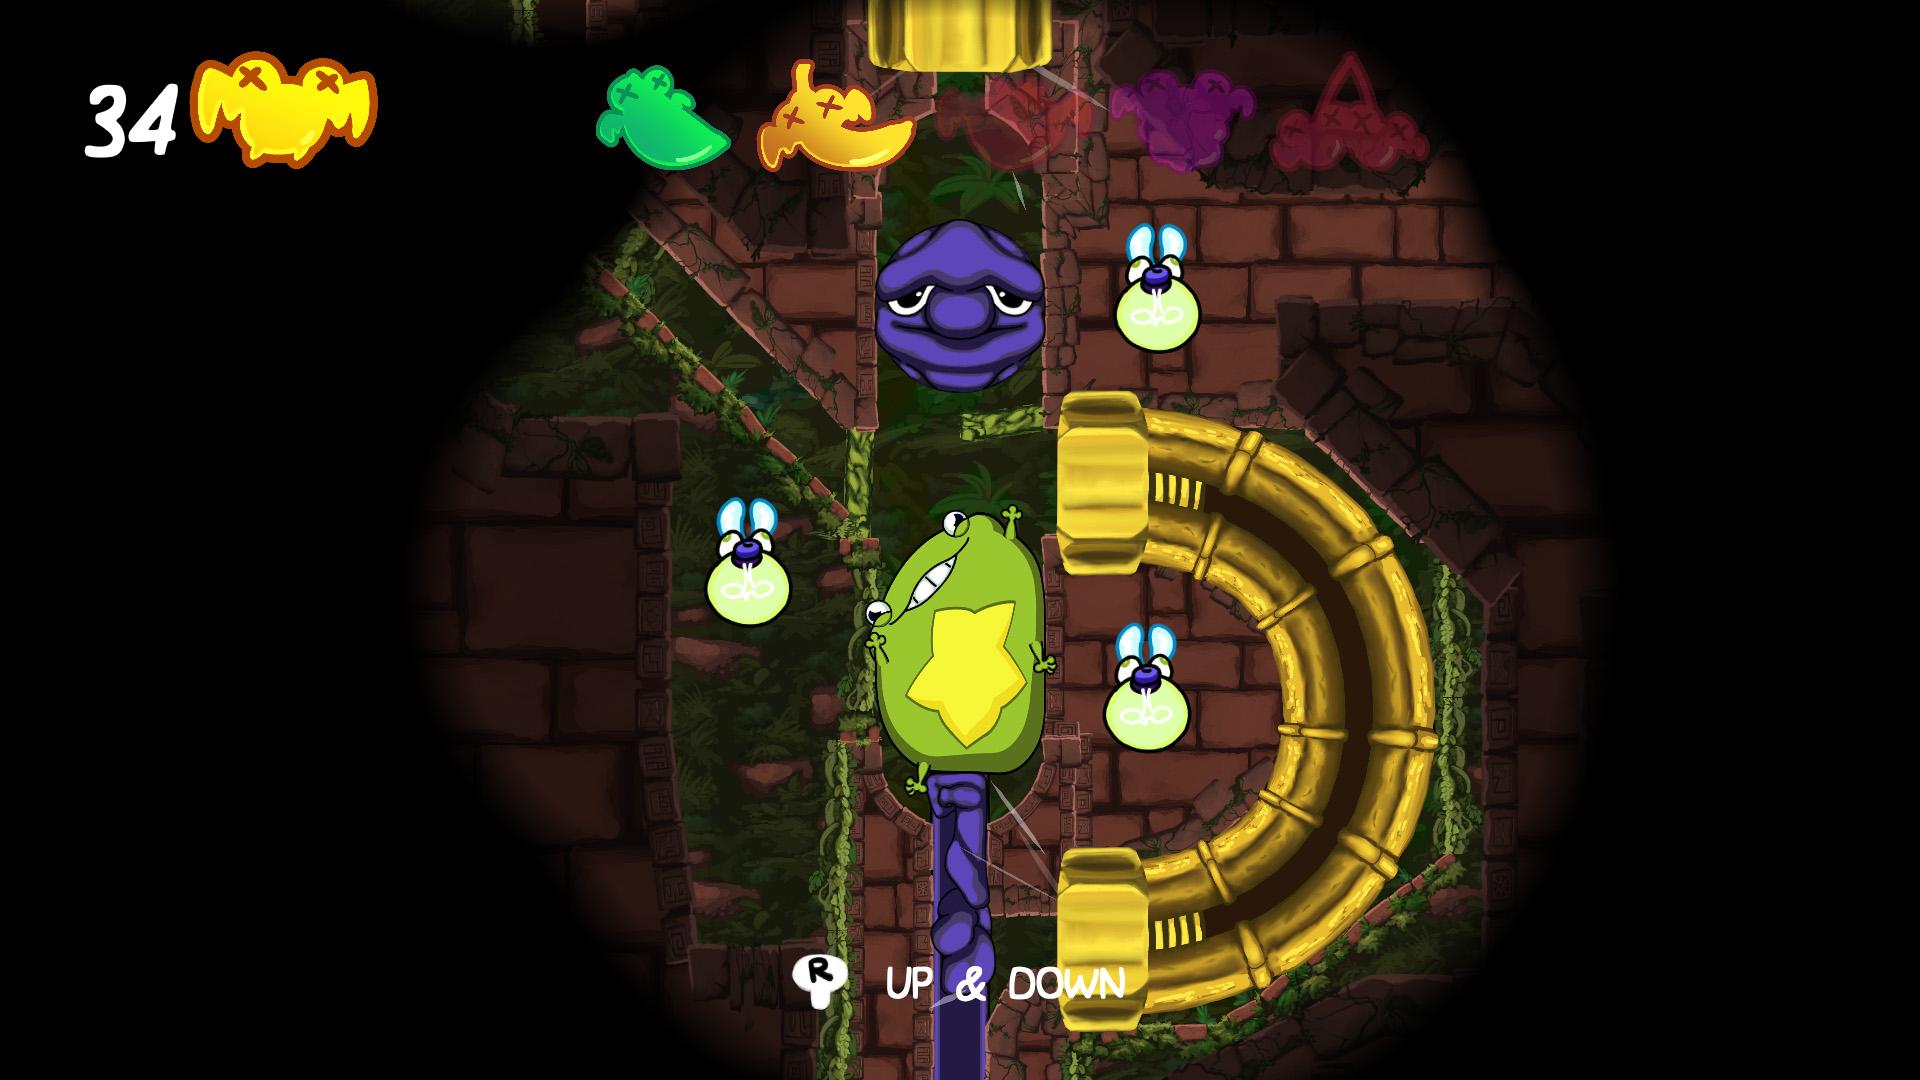 Pump the Frog screen_1920x1080_2018-11-22_11-41-06.jpg